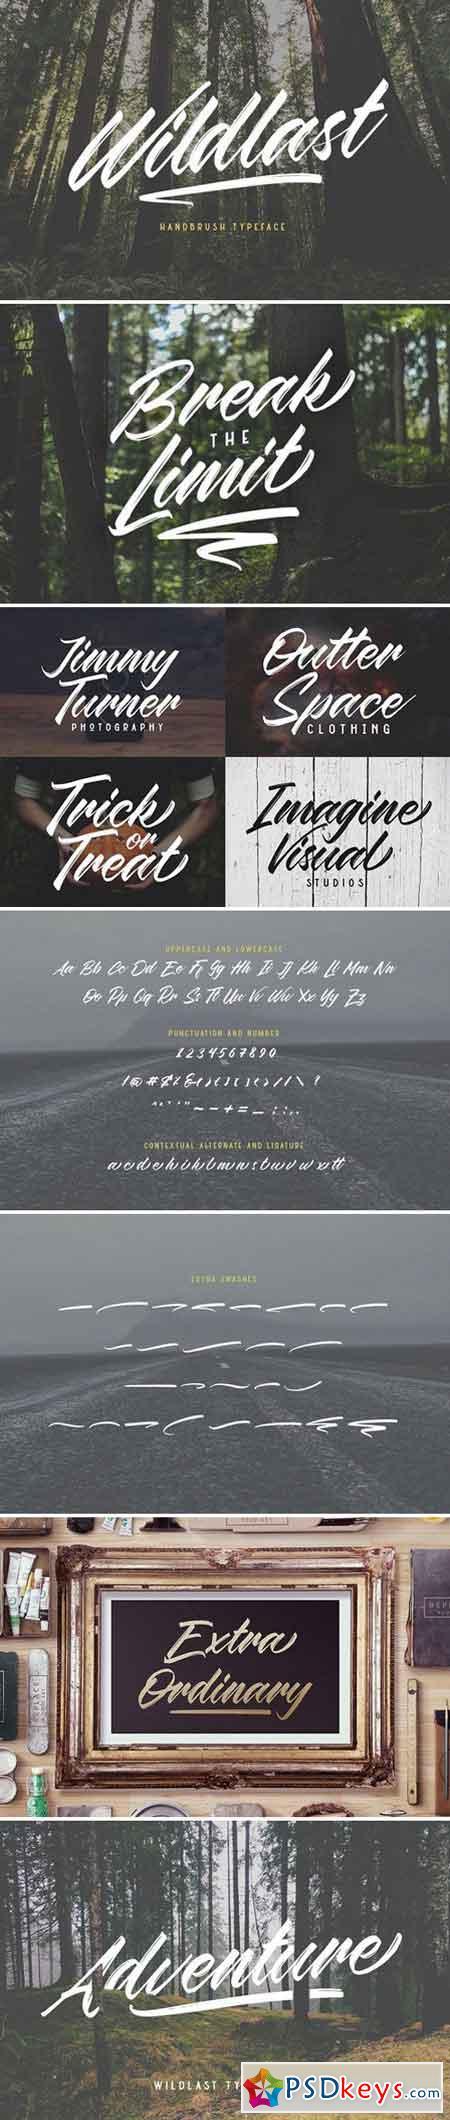 Wildlast Handbrush Typeface 2232902